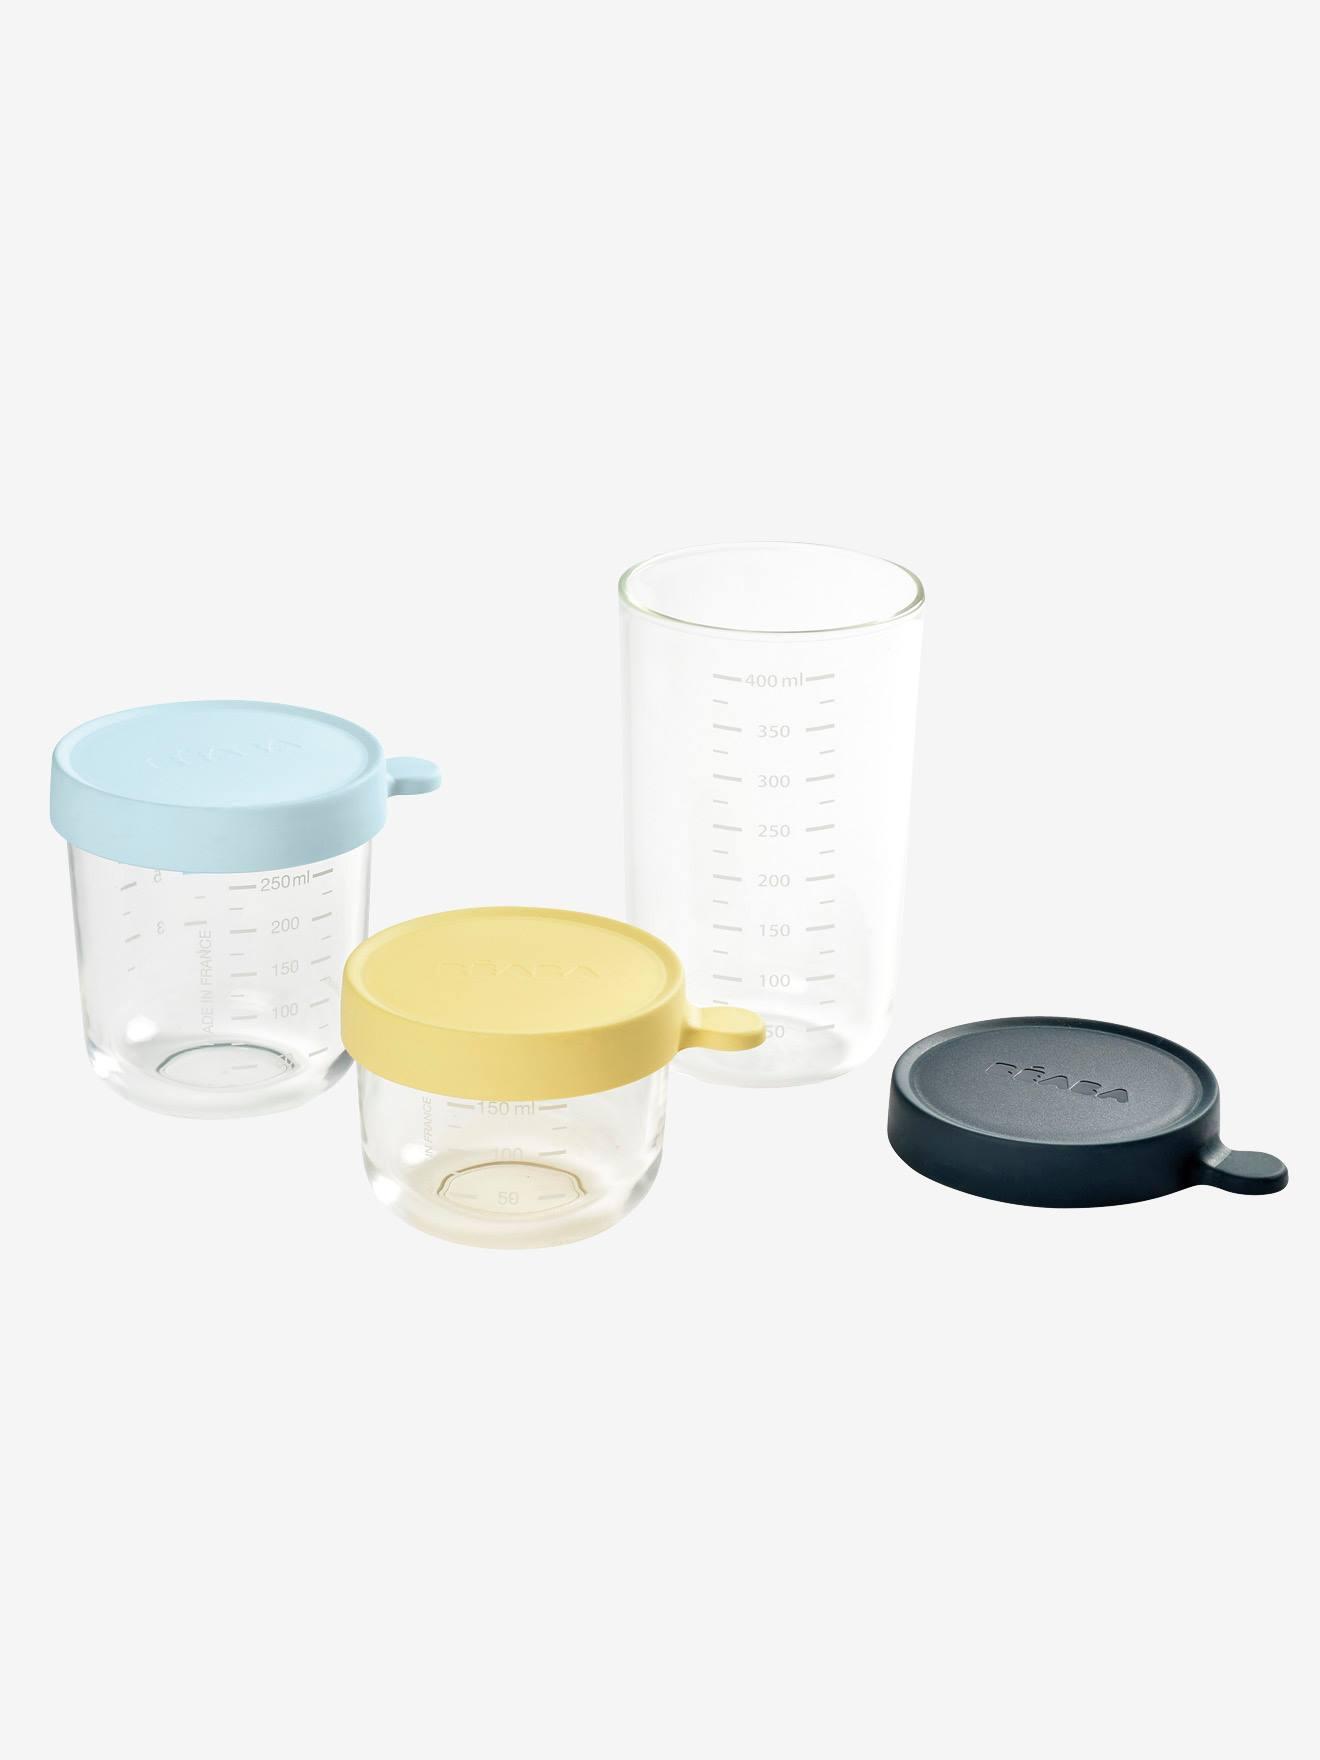 BEABA Pack de 3 recipientes de vidrio BEABA no color